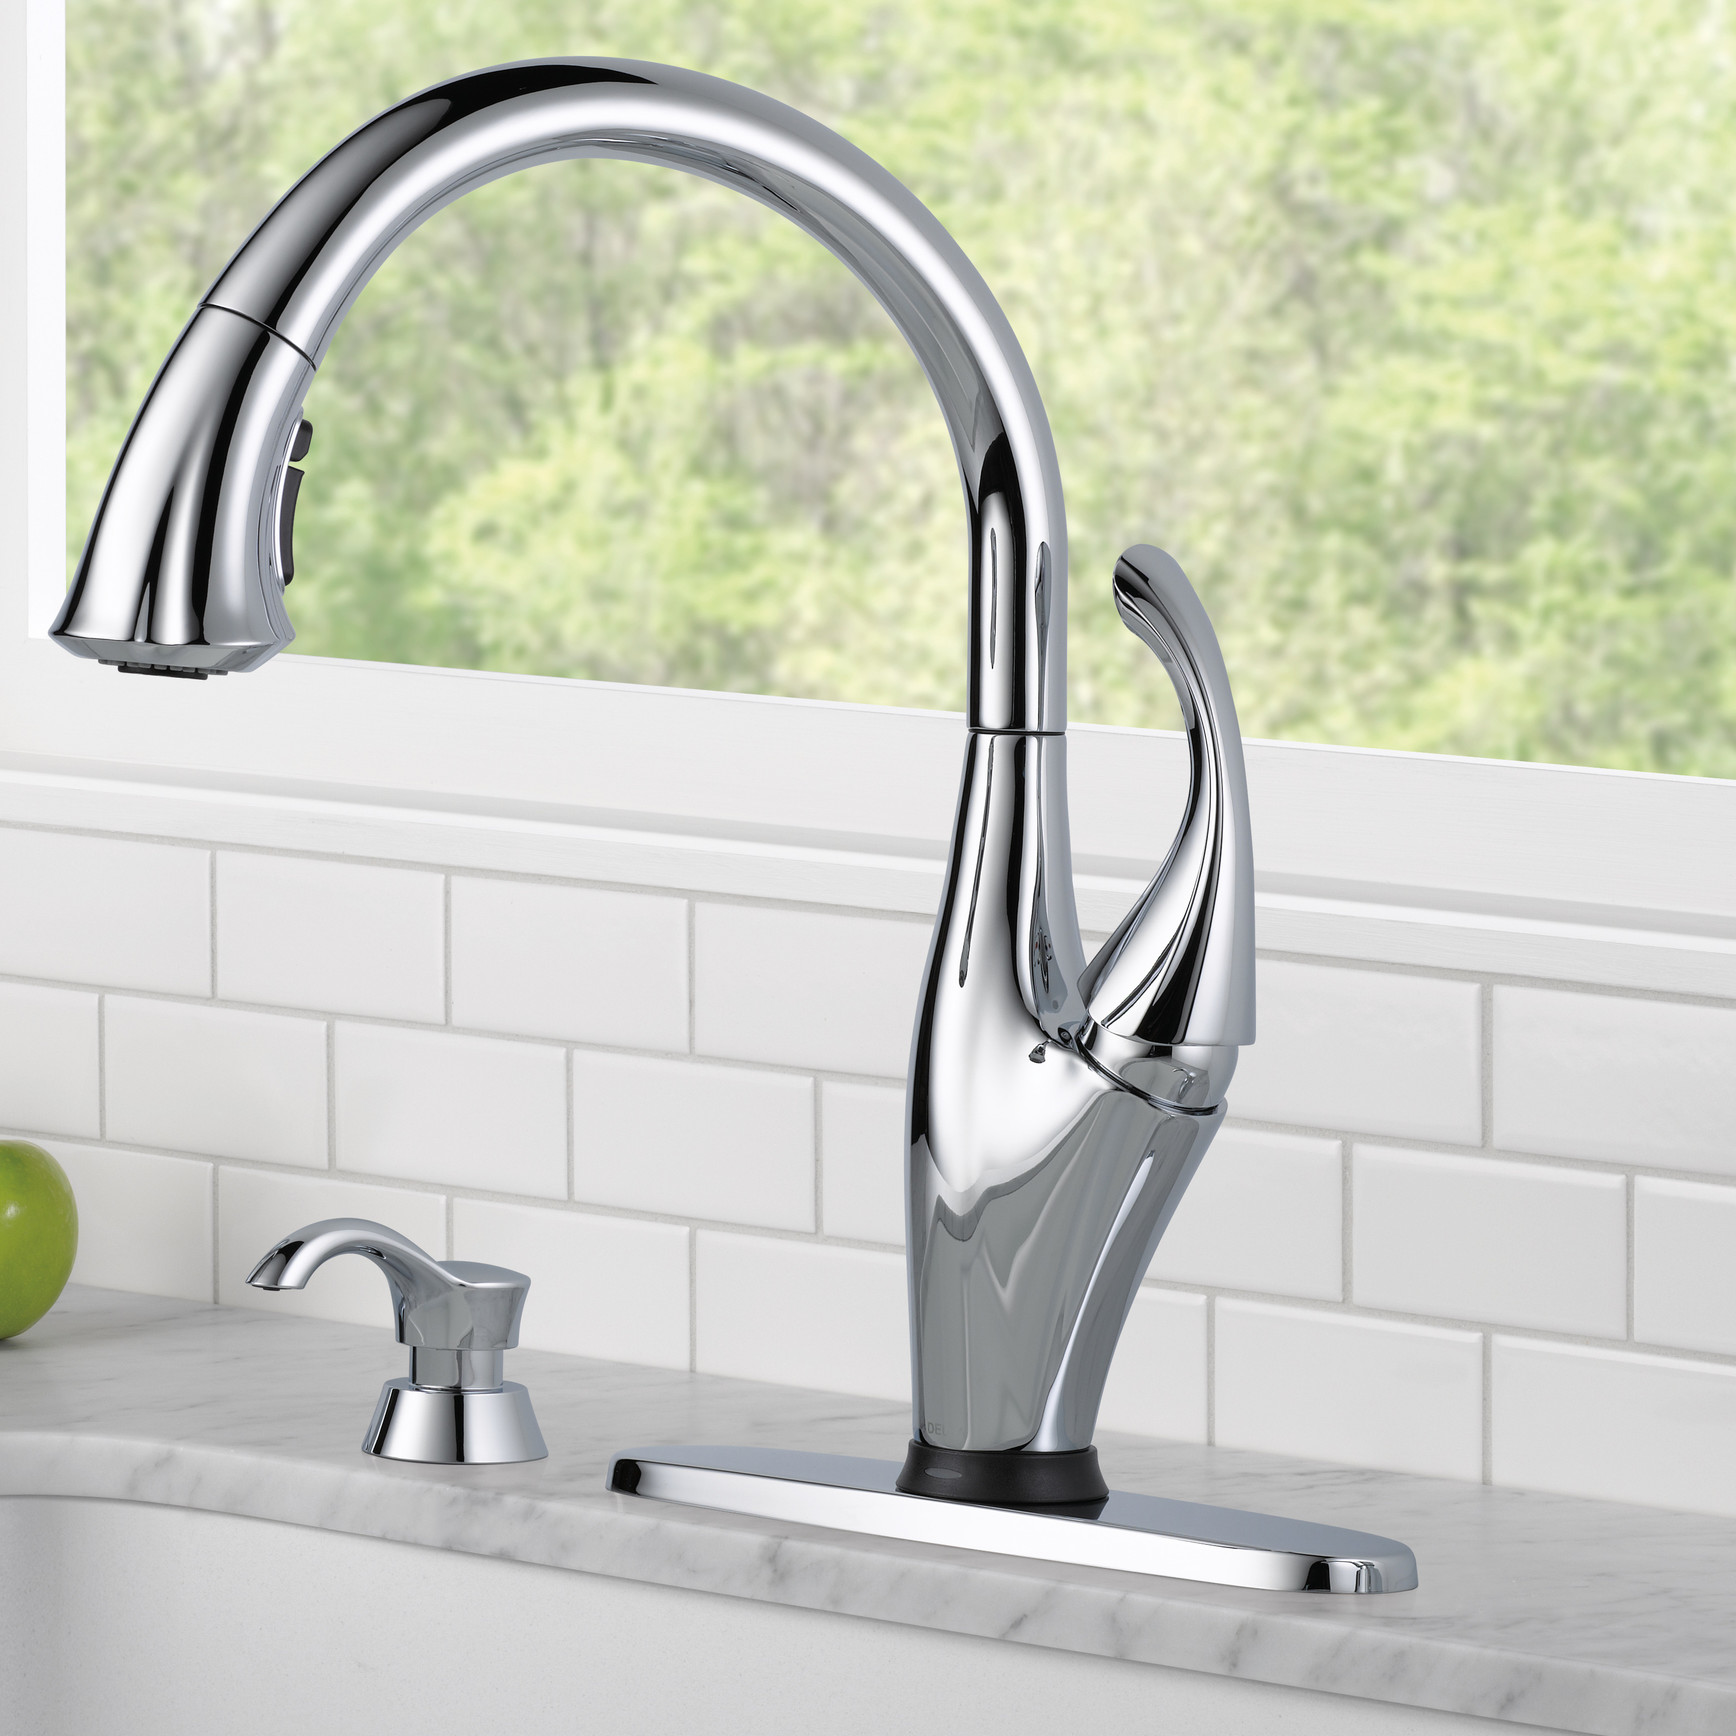 Dazzling Design Delta Touch Kitchen Faucet 29